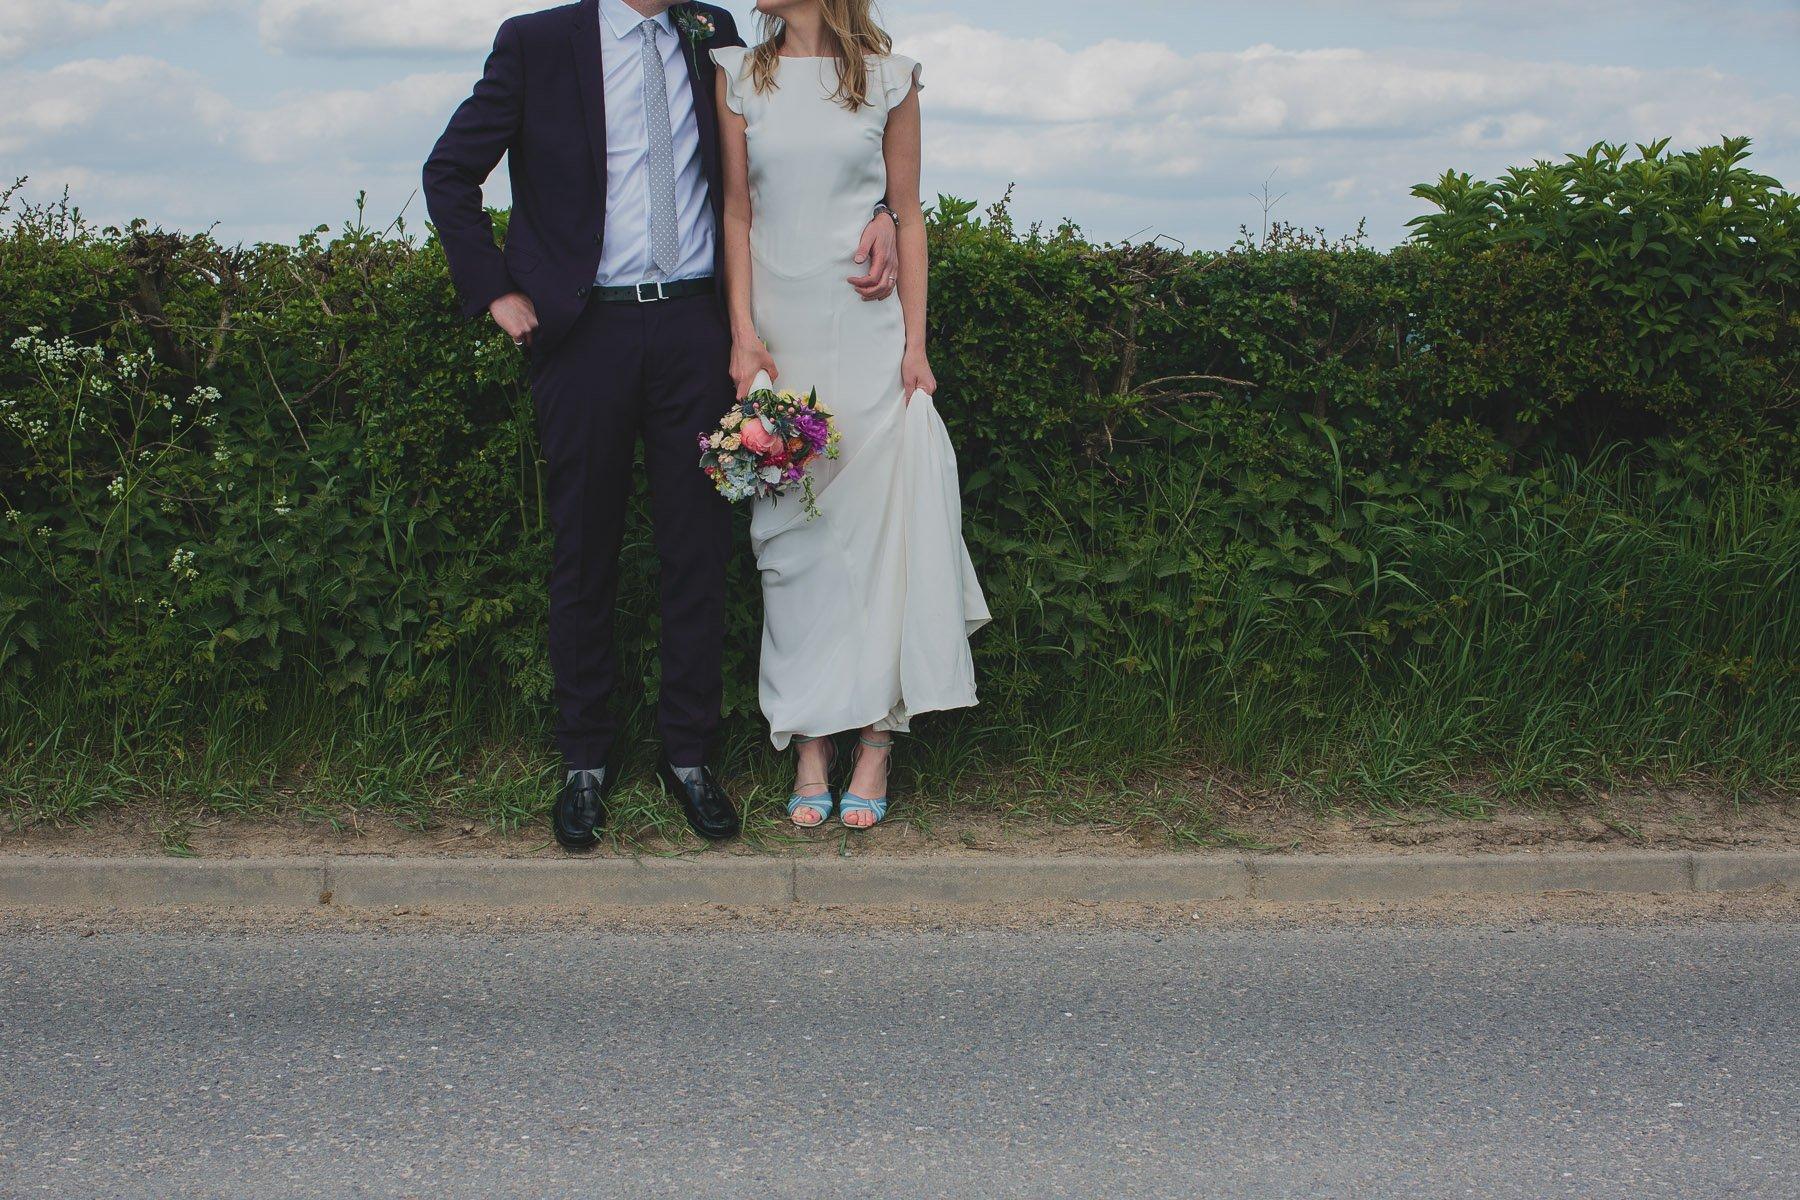 Buckinghamshire-Wedding-Lizzie-Duncan-111